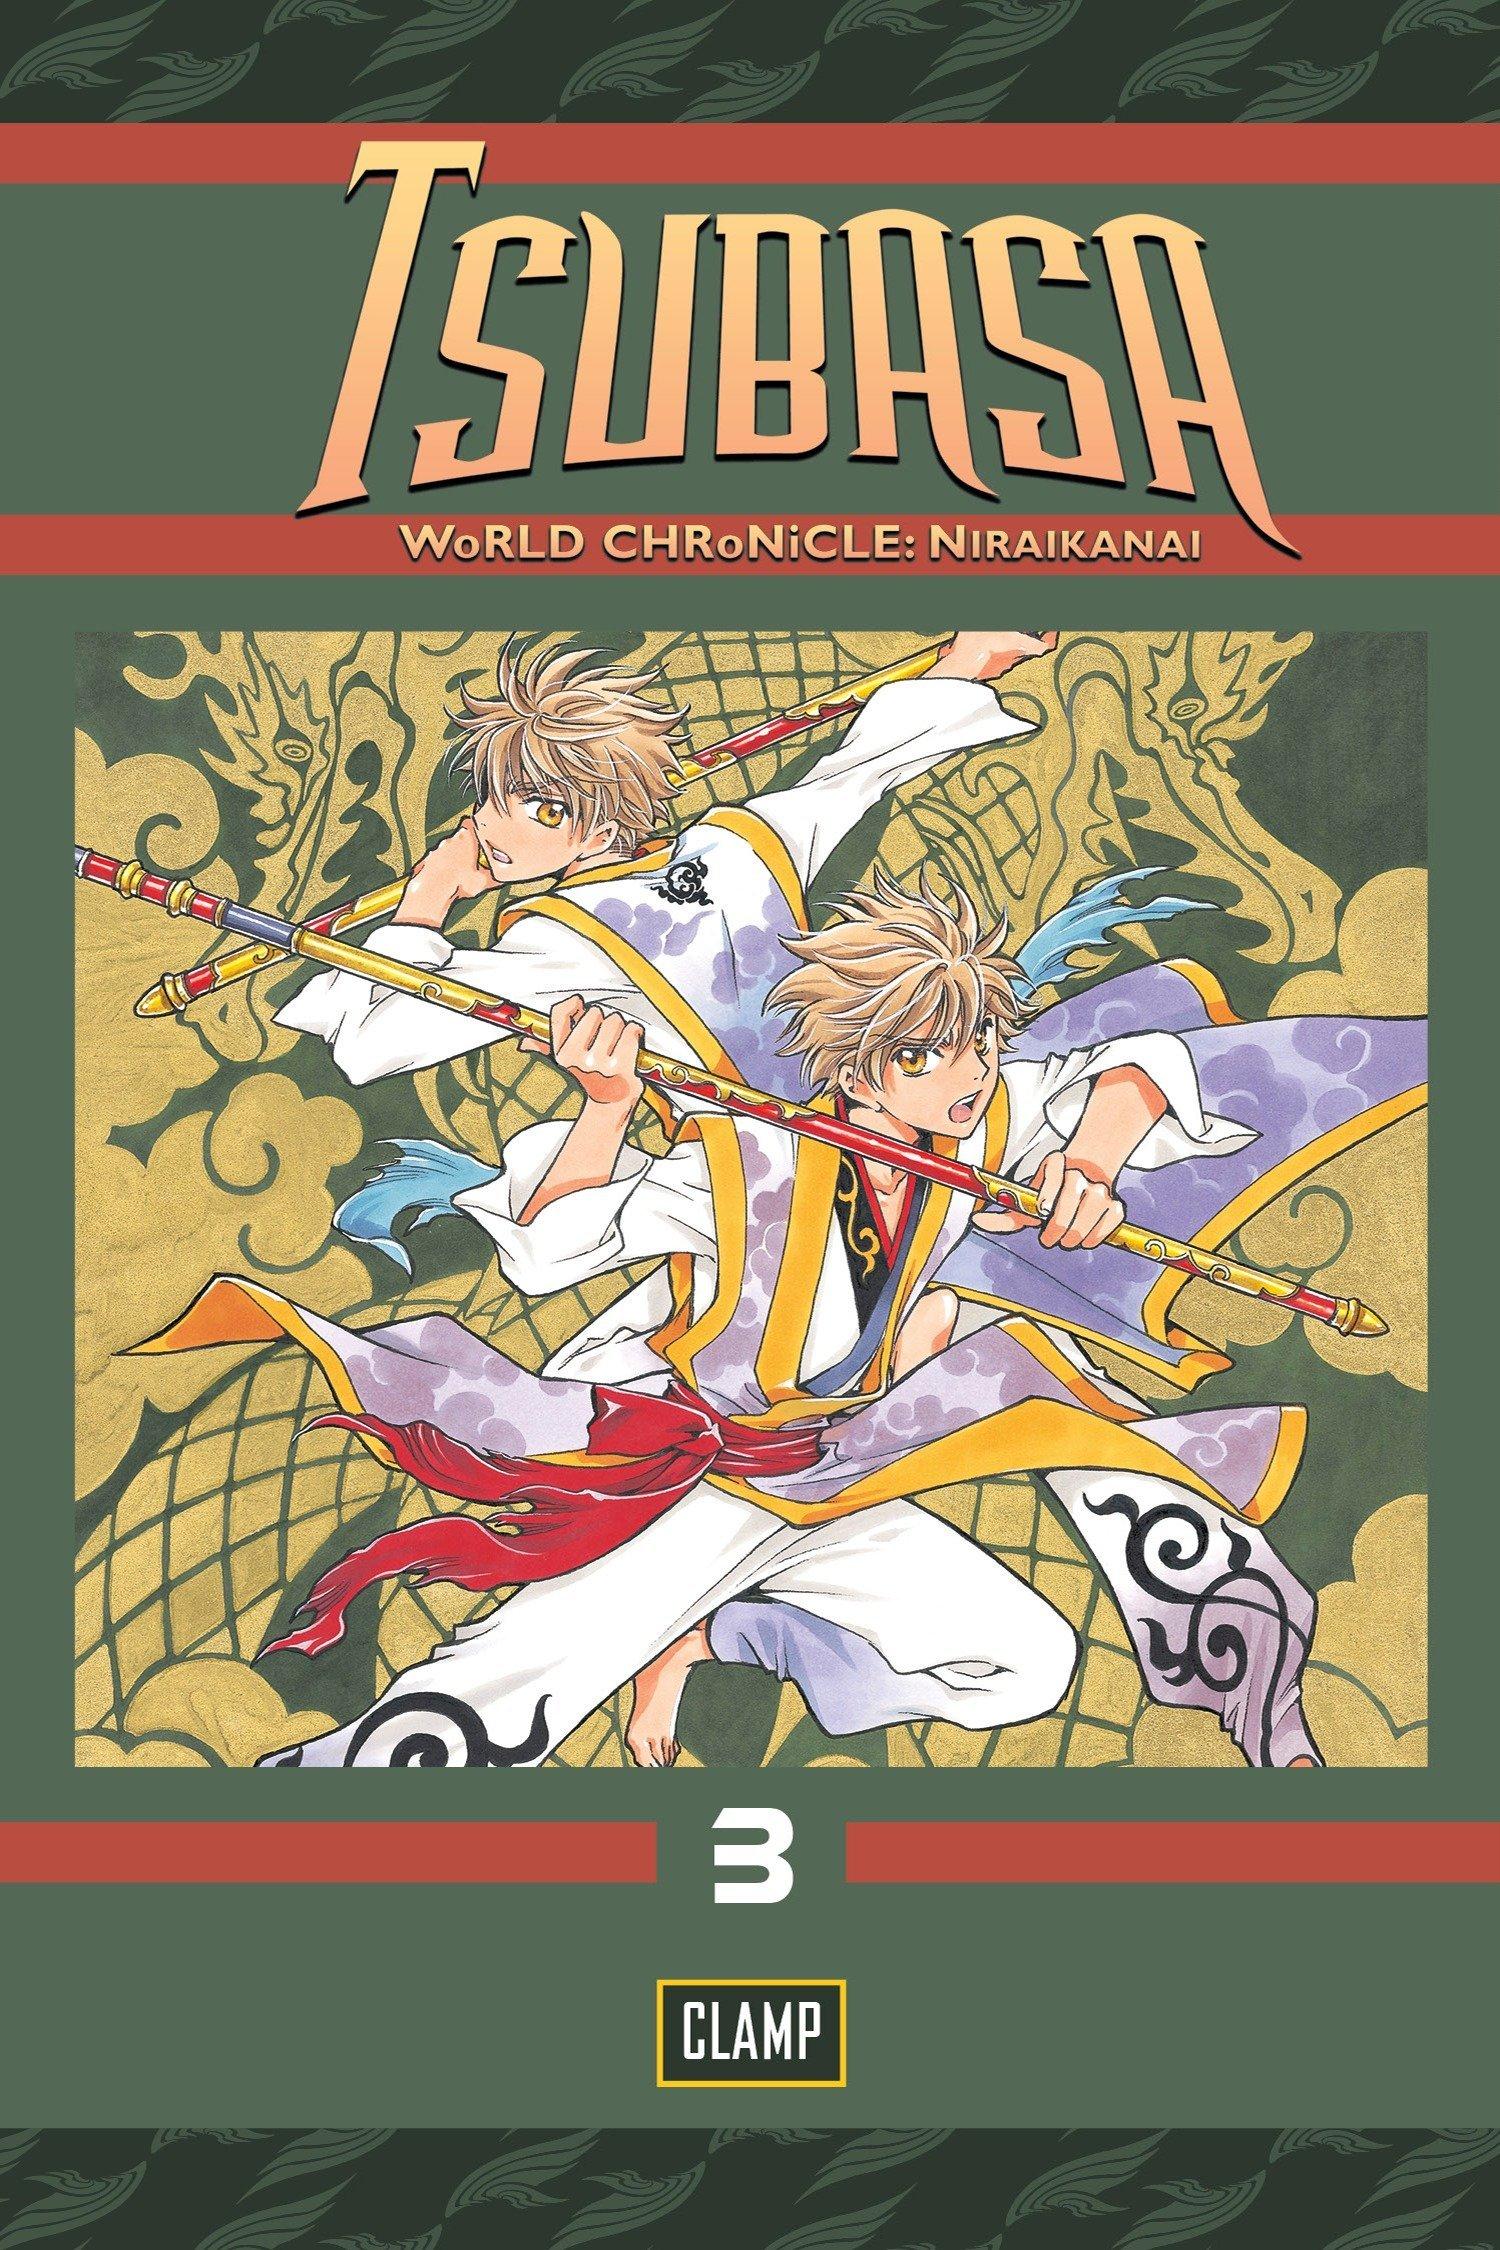 Tsubasa- WoRLD CHRoNiCLE 3 ebook by Clamp